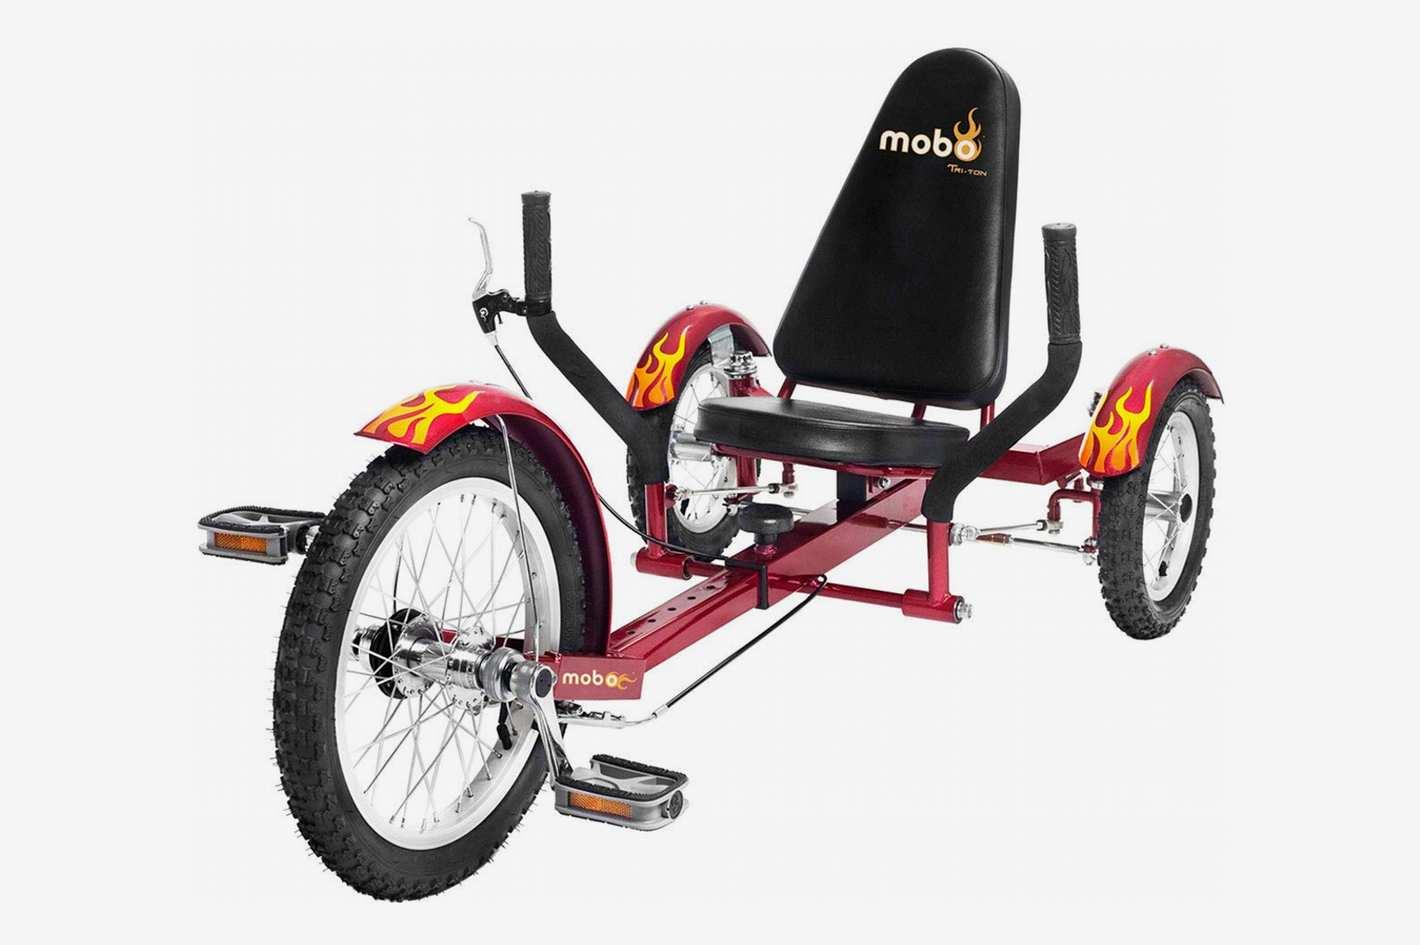 Mobo Triton Pedal Go Kart Trike